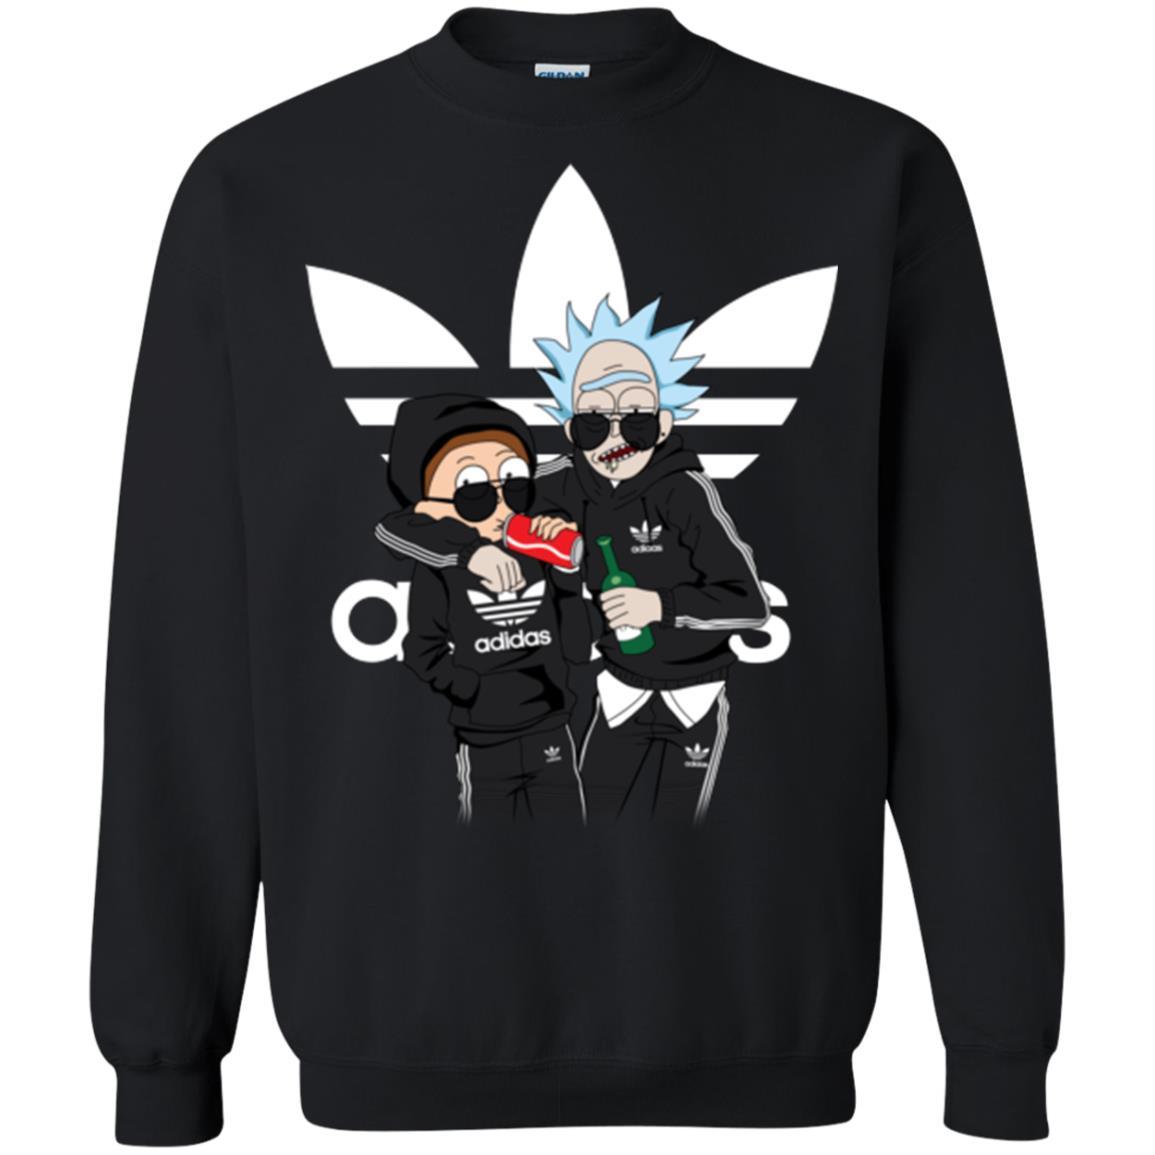 image 292px Rick and Morty Adidas Mashup T Shirt, Hoodies, Tank Top